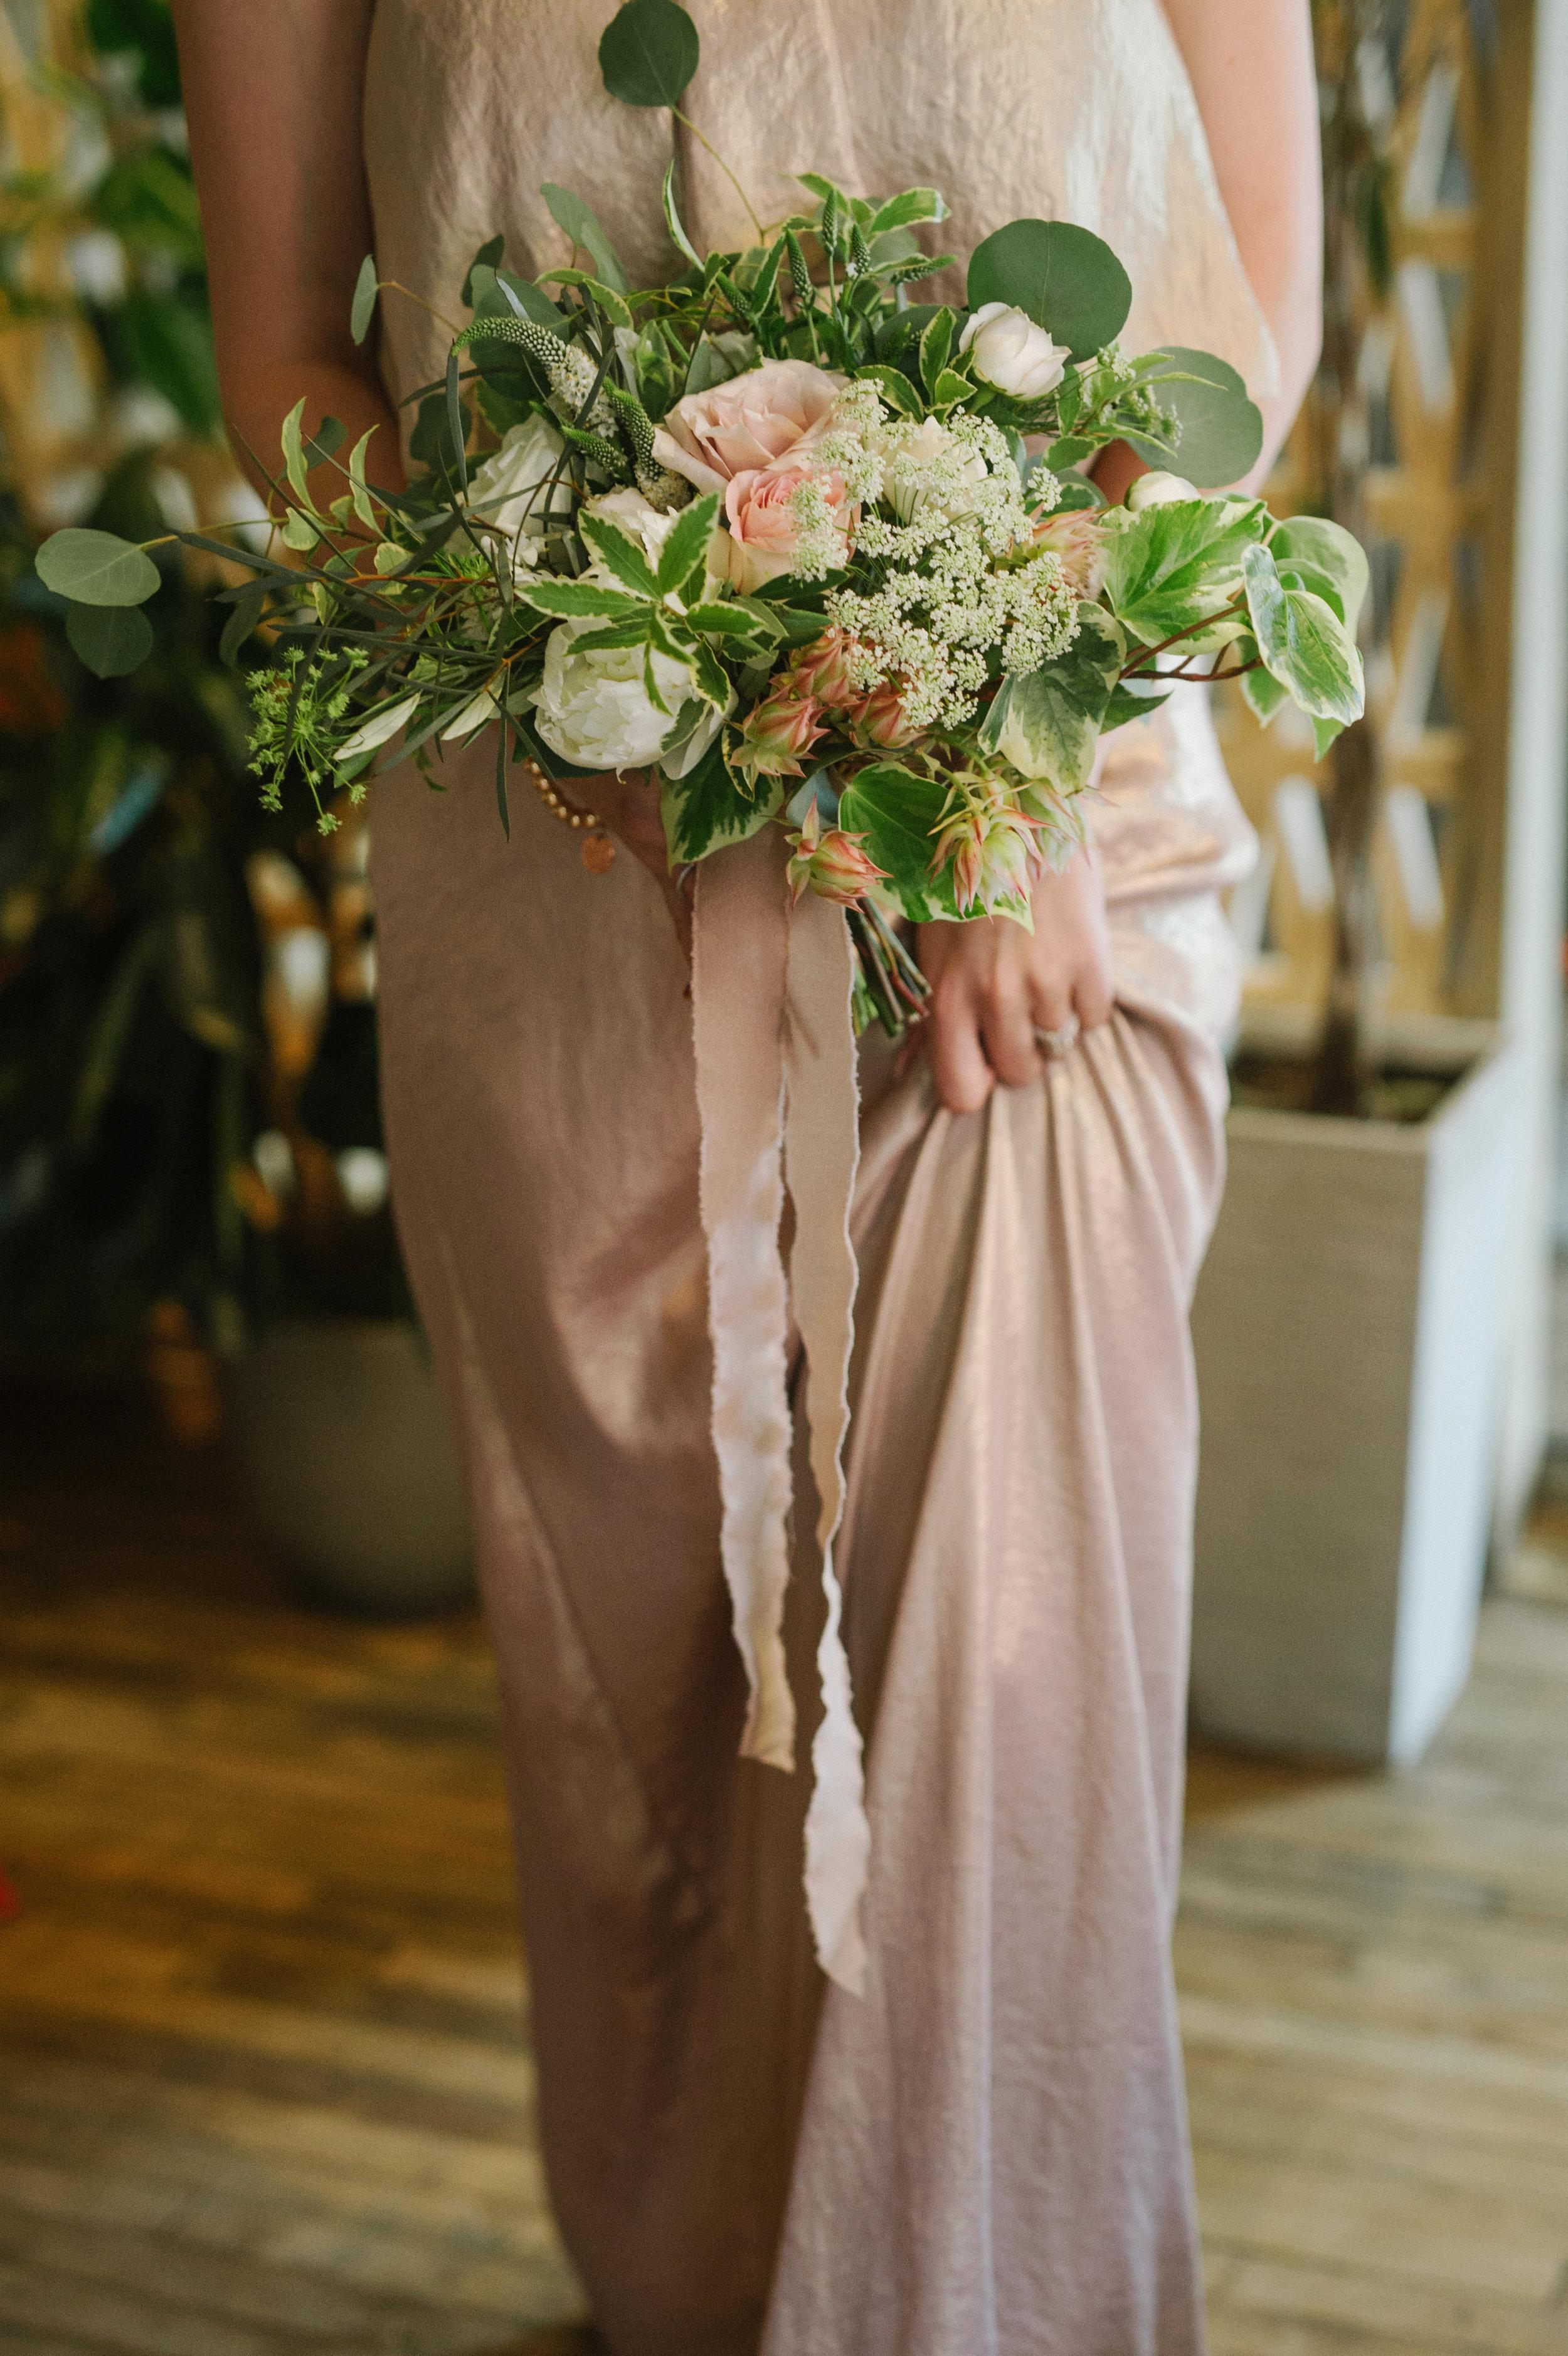 Calgary_Wedding_Photography_Bridgette_Bar_Bridesmaids_Shoot_2018_HR040.jpg